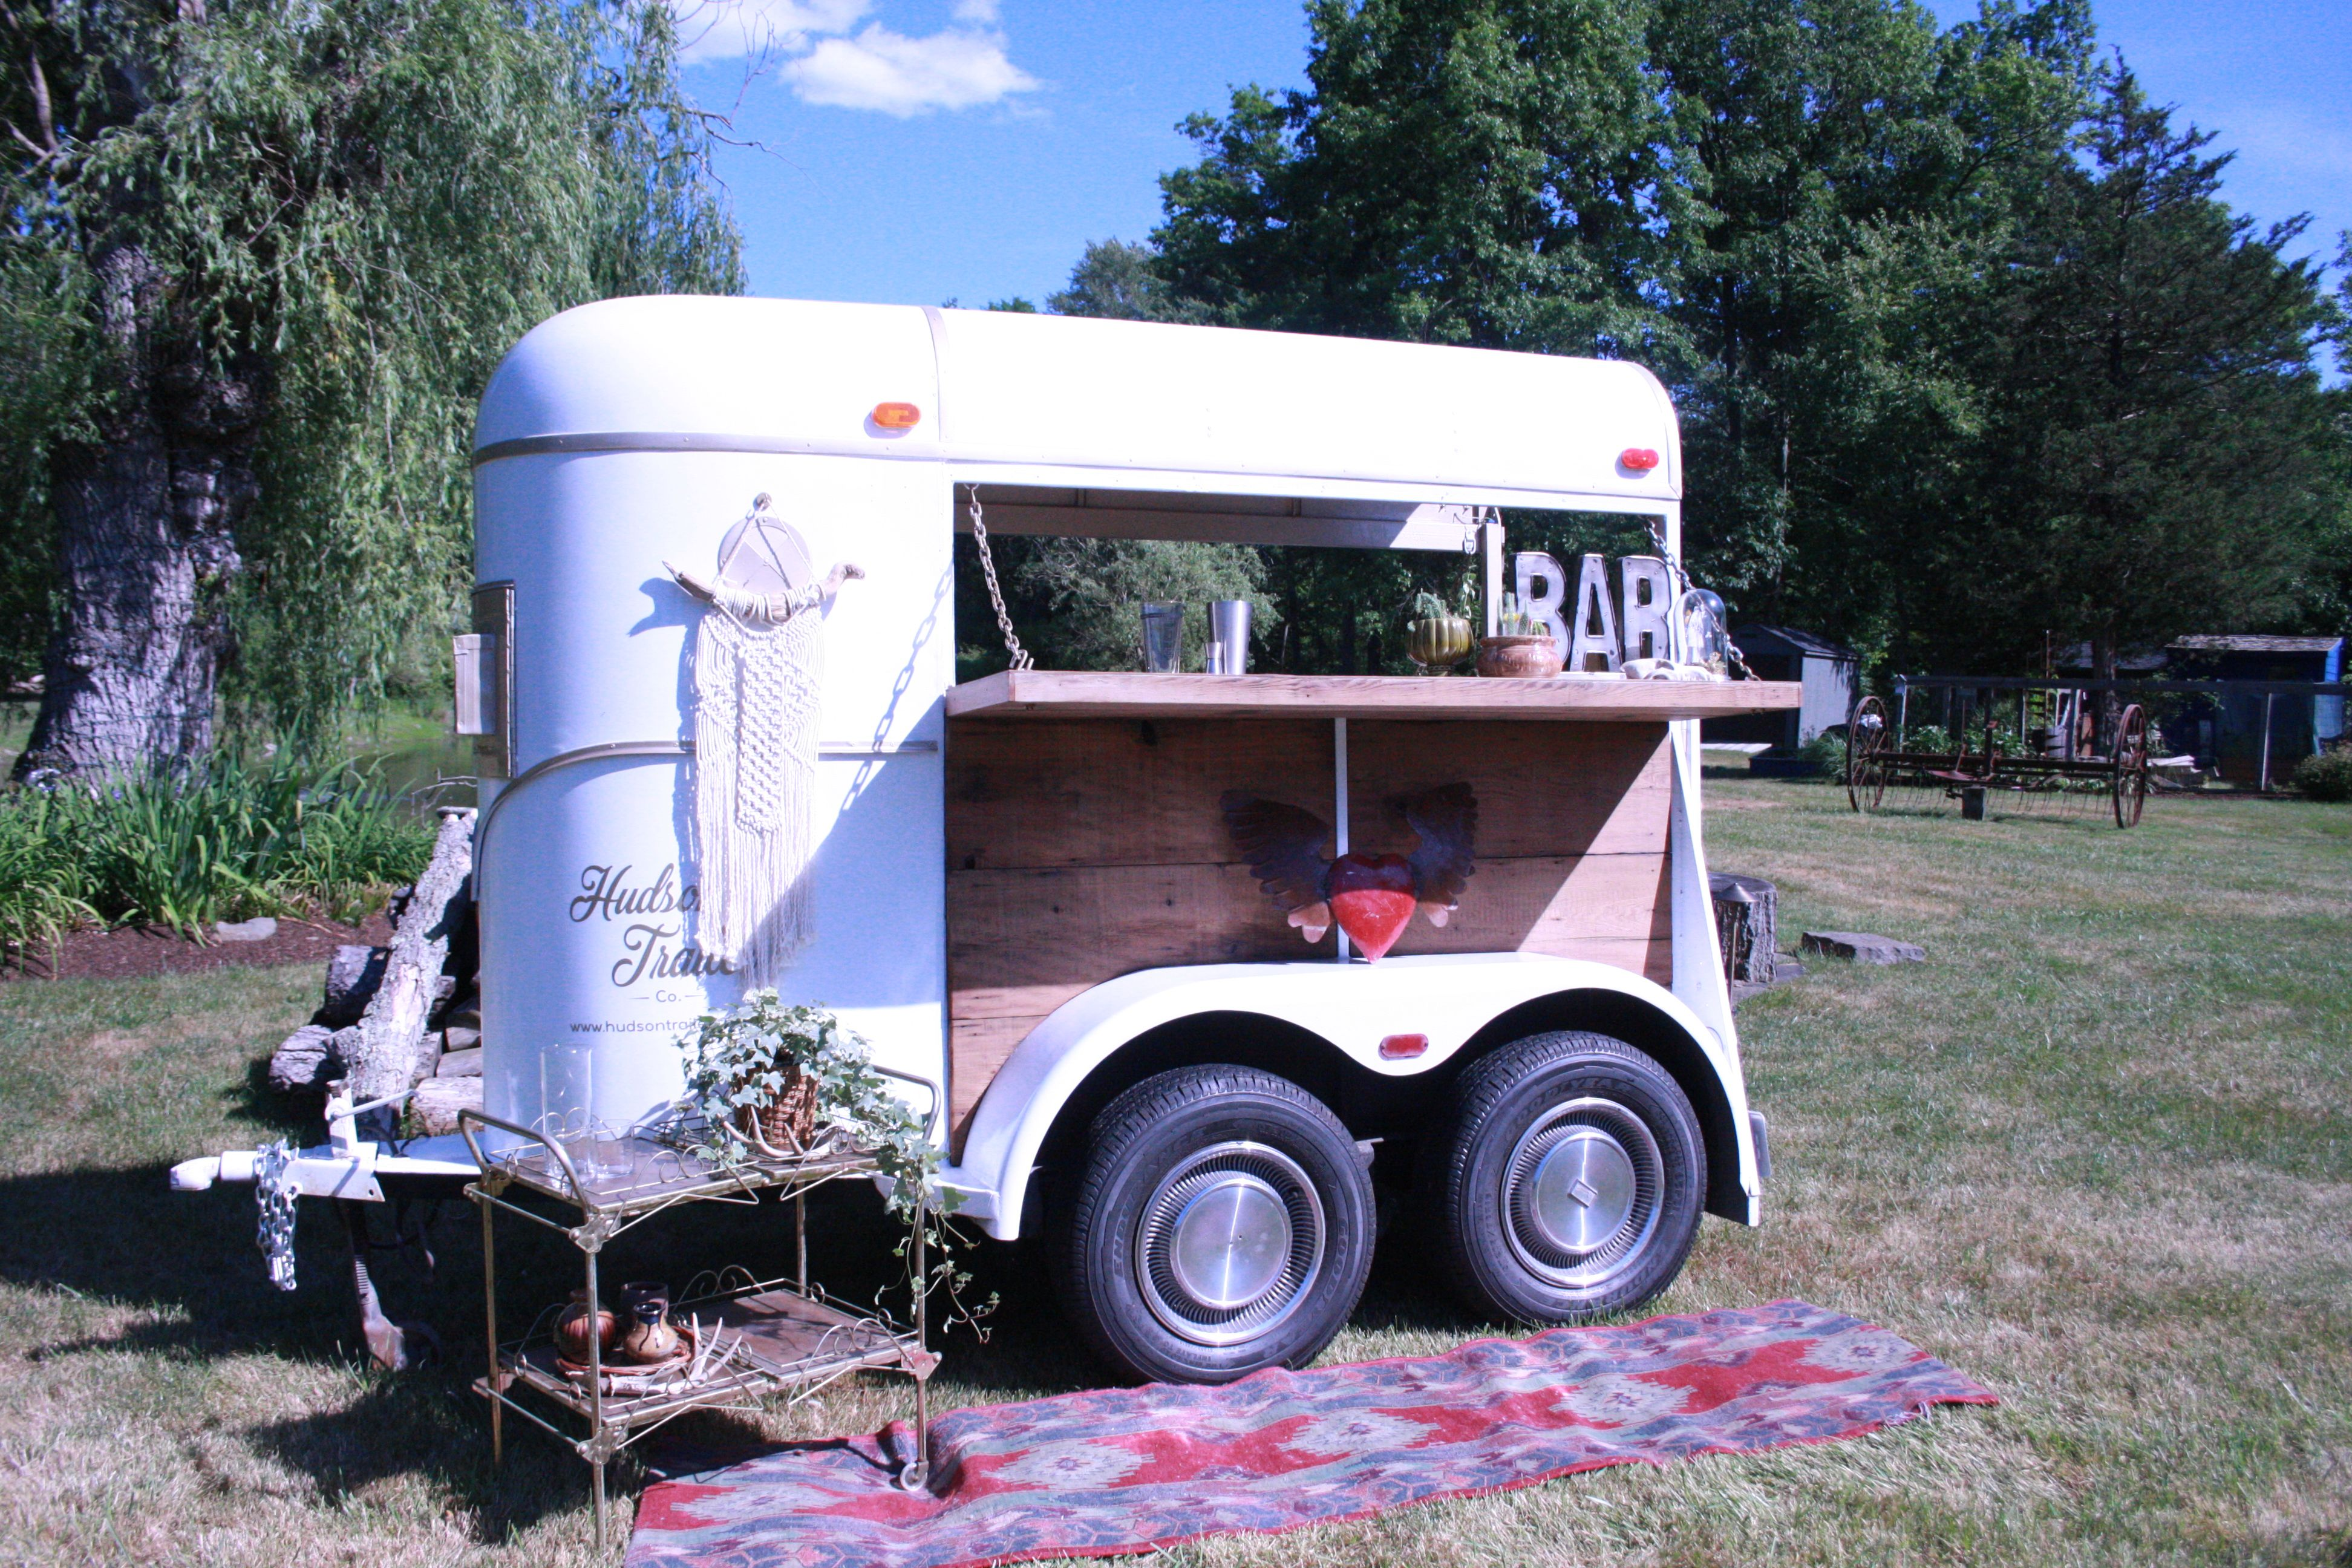 hight resolution of hudson trailer co camper bar trailer wedding trailer